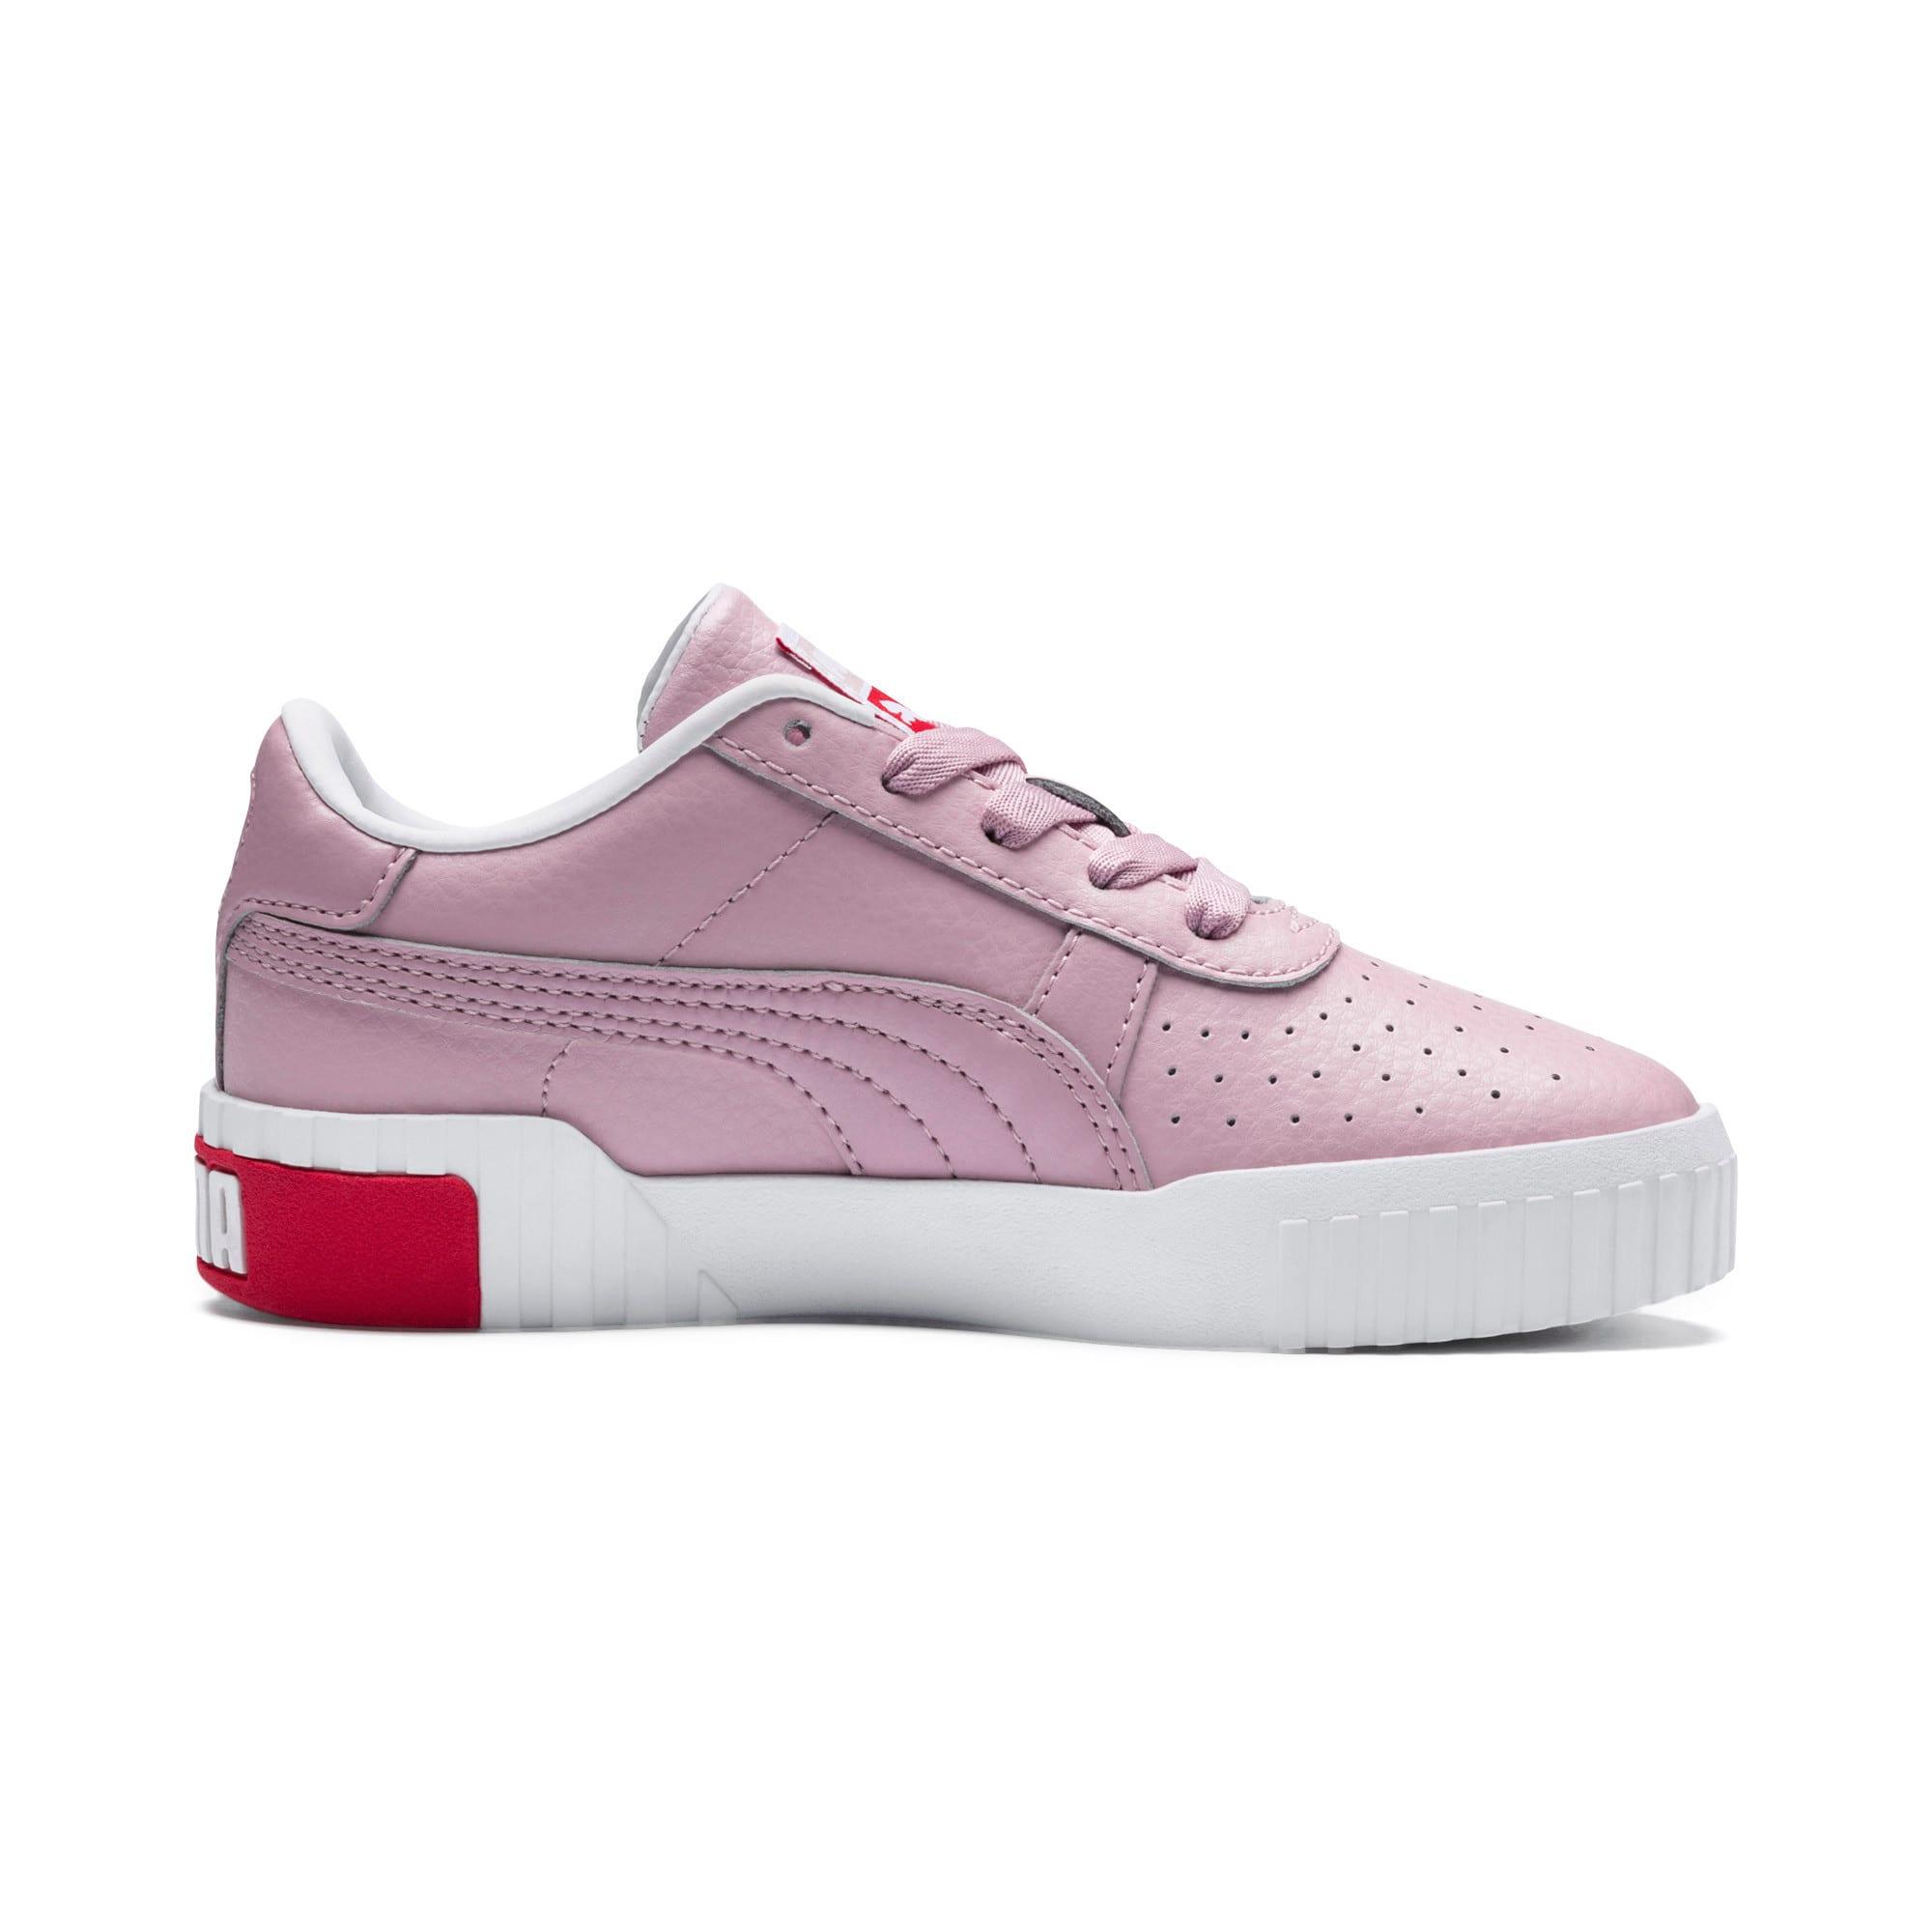 Thumbnail 5 of Cali sneakers voor meisjes, Puma White-Hibiscus, medium